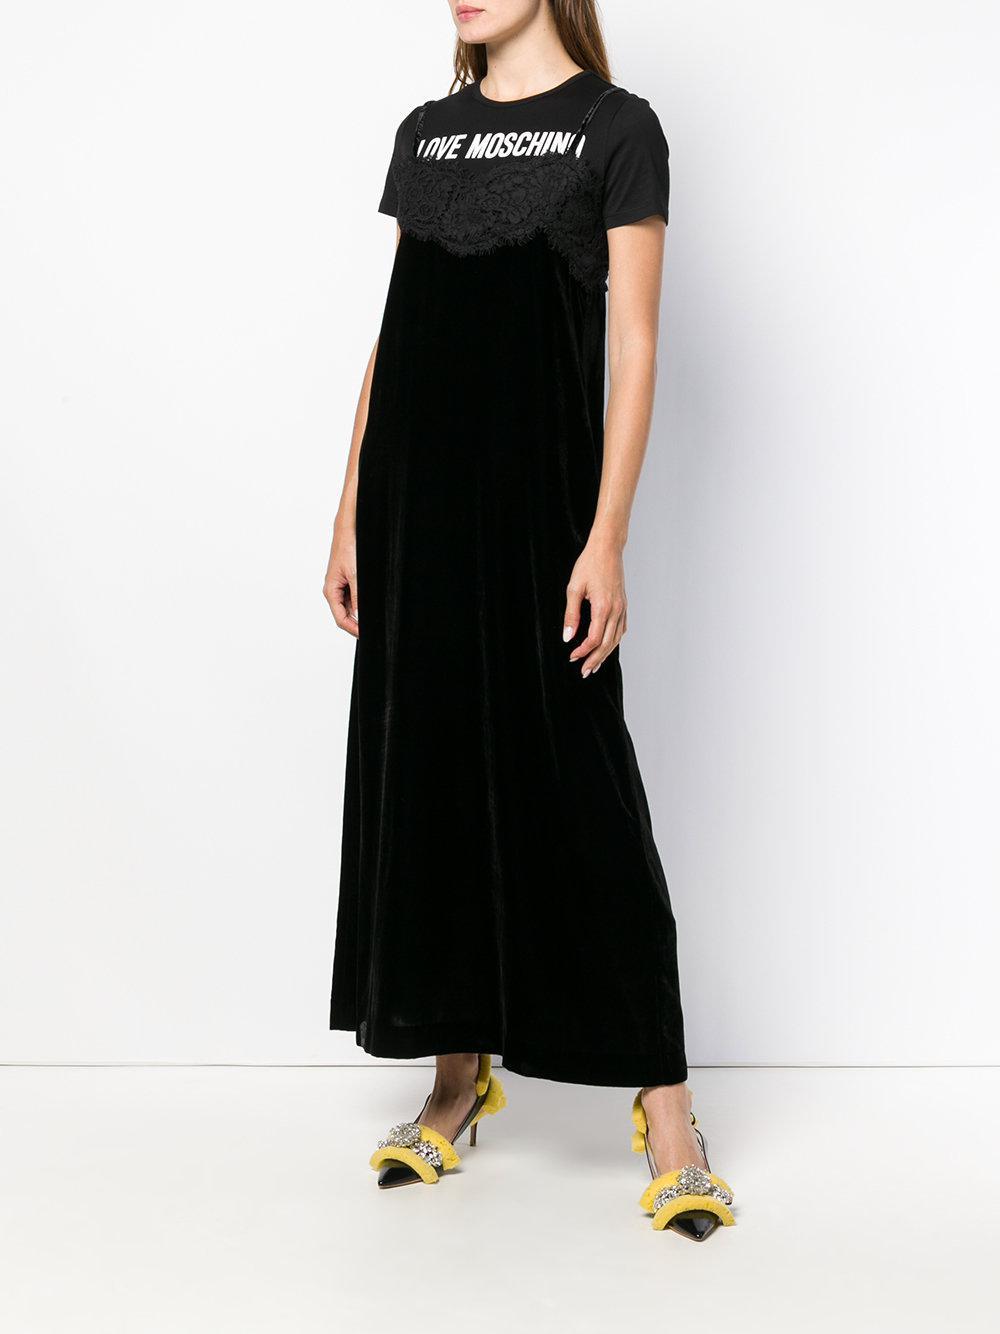 lingerie T-shirt dress - Black Love Moschino gRaTR0lm